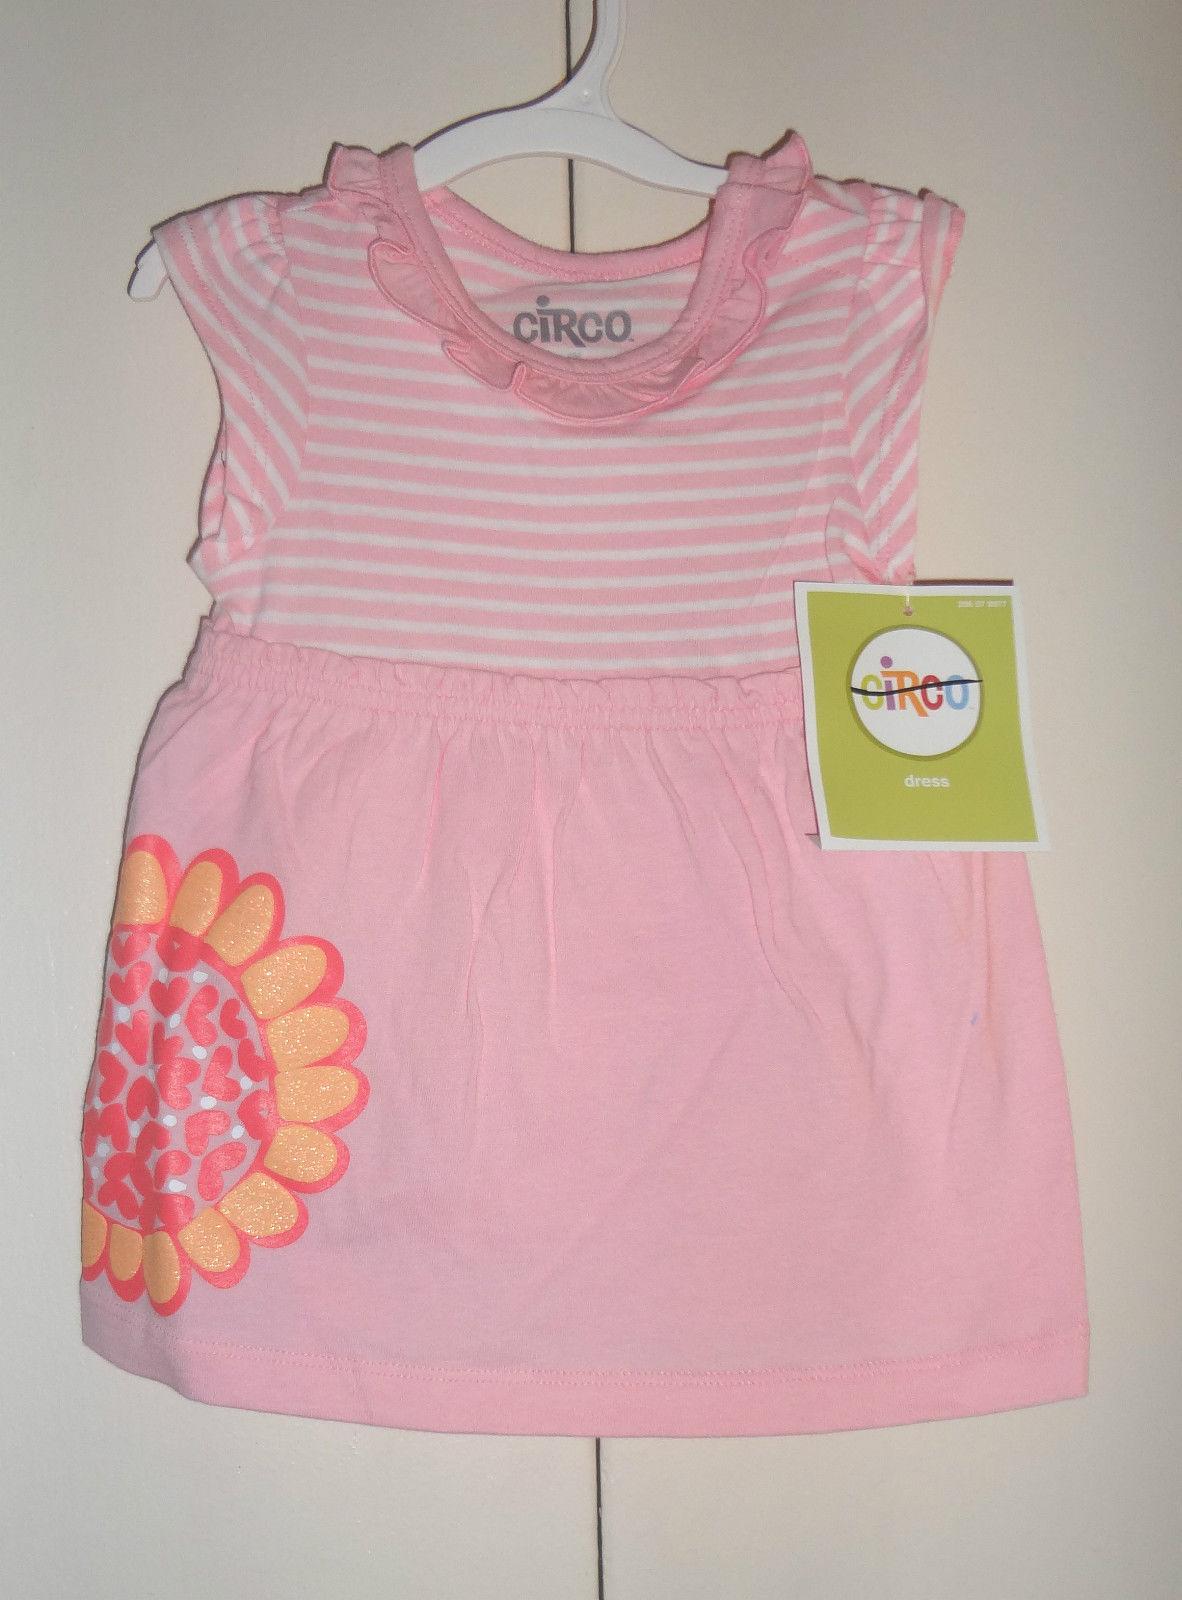 Circo Infant  Girls Dresses Flower  Size 6 Months   NWT - $6.30